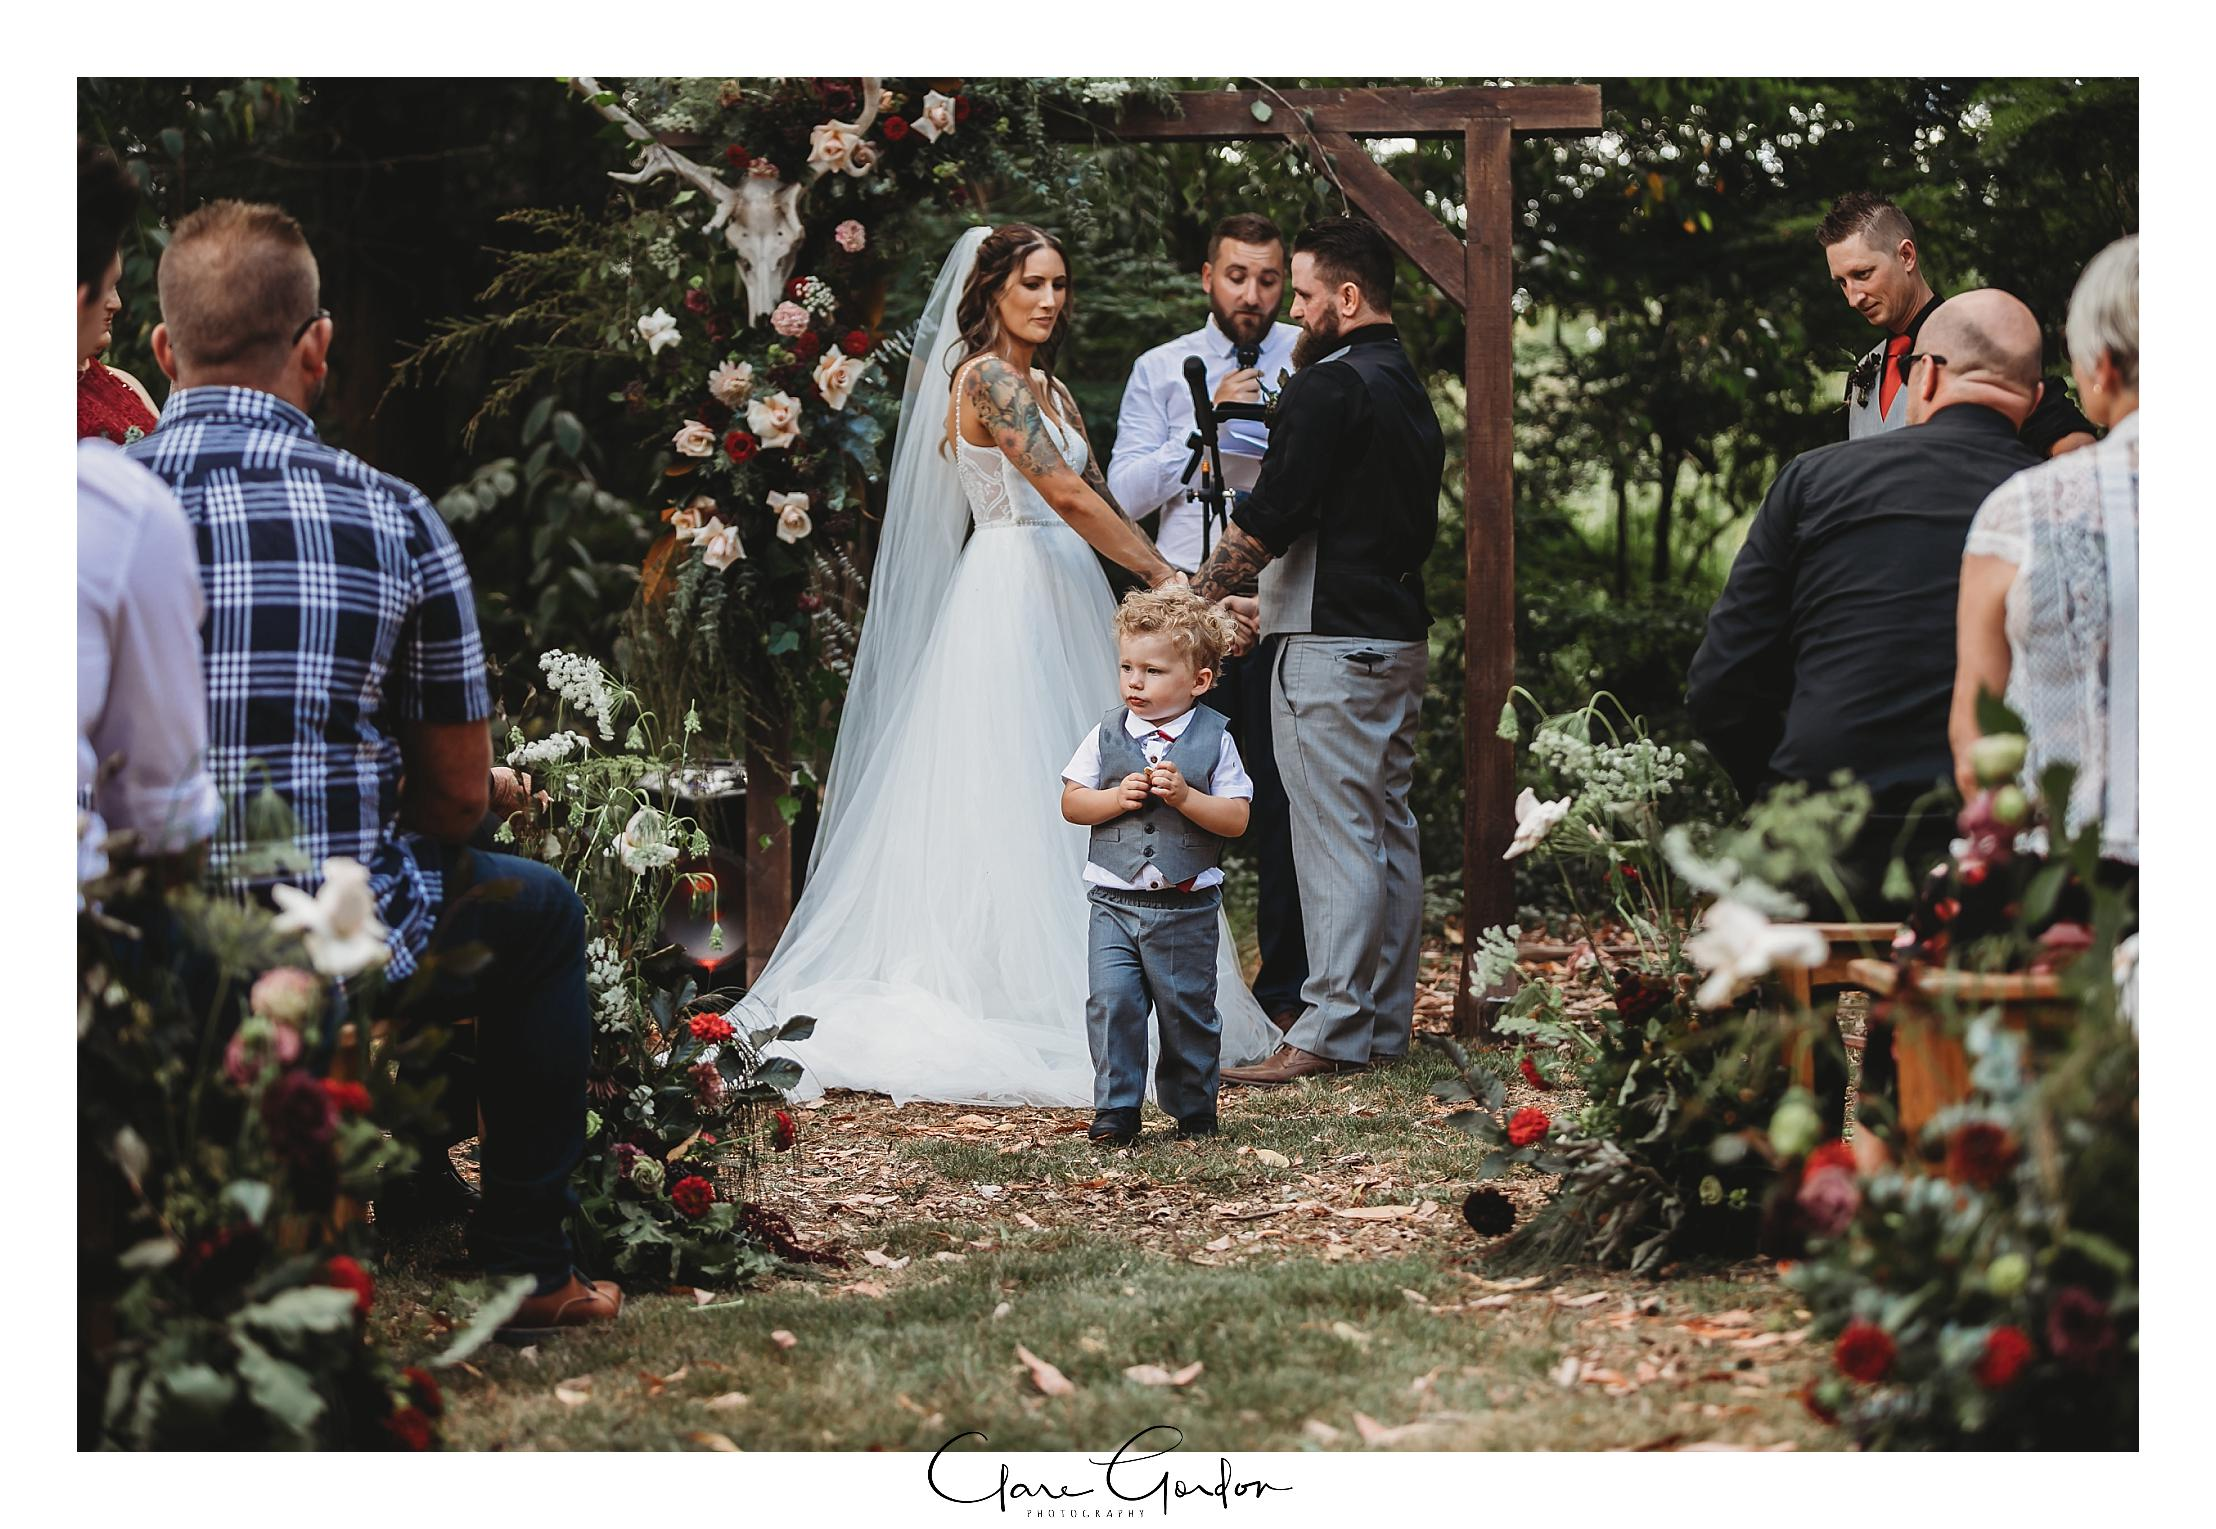 Waikato-wedding-photographer-Forest-weddnig-Hamilton-wedding-Newzealand (74).jpg